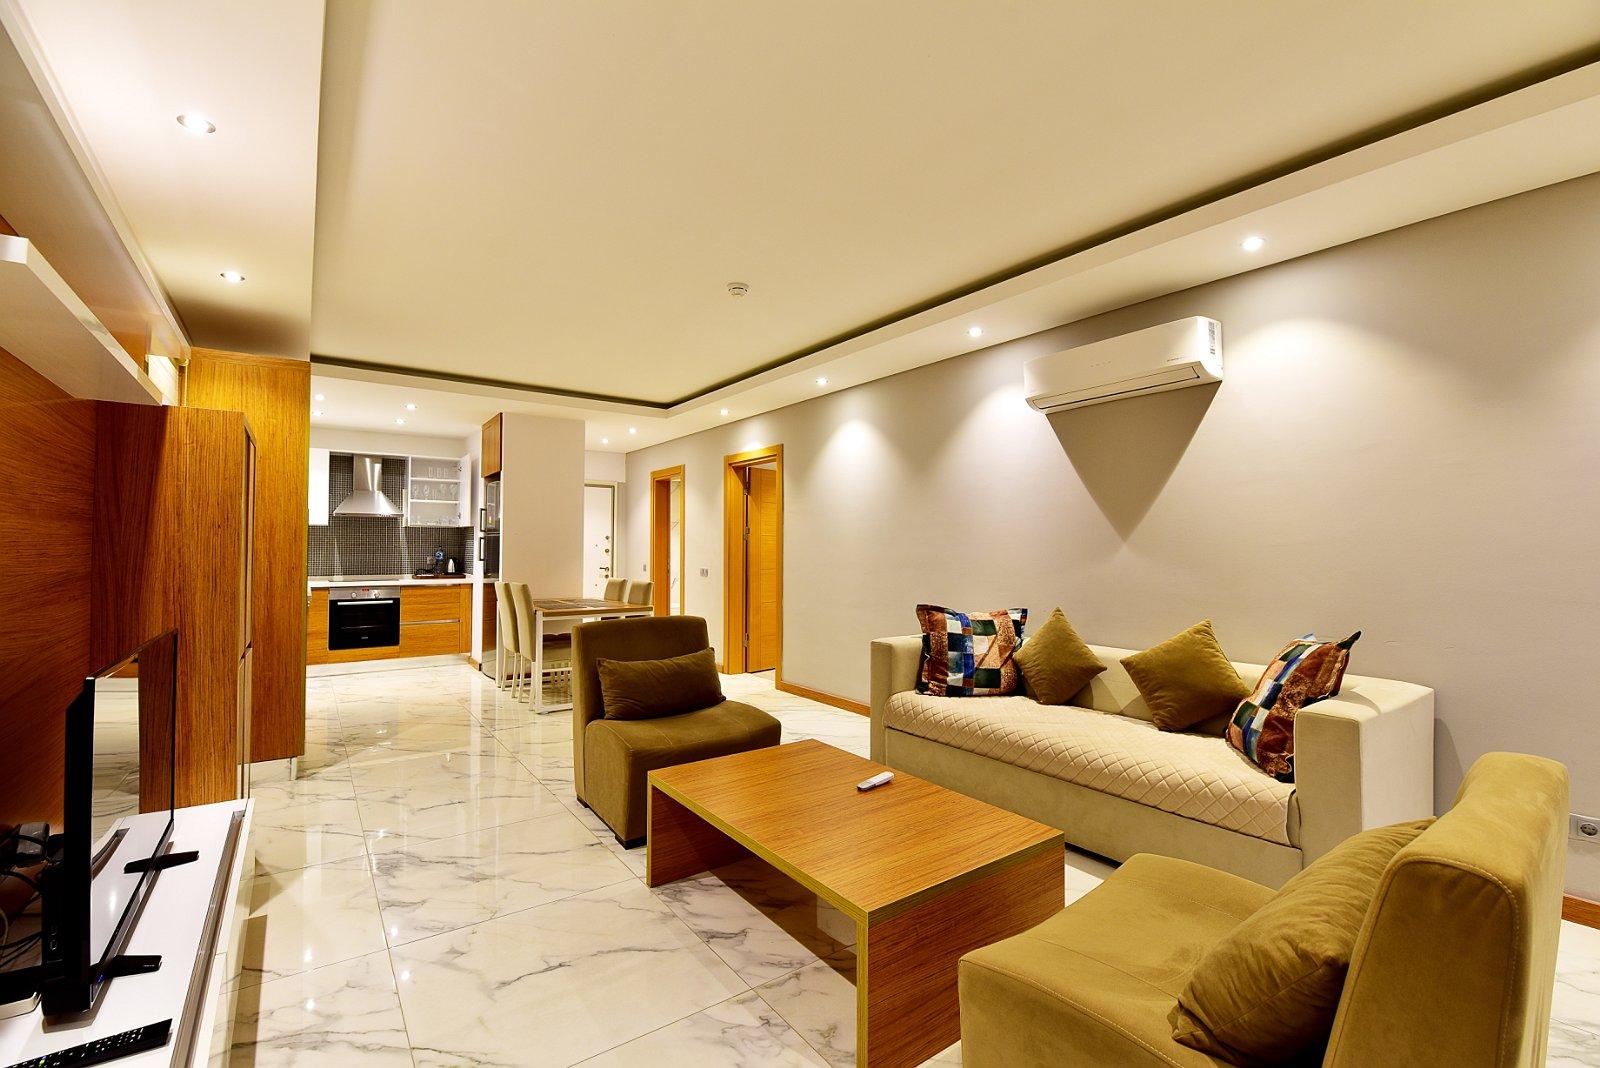 bodrum-jasmin-elite-residence-hotel-1-room-07